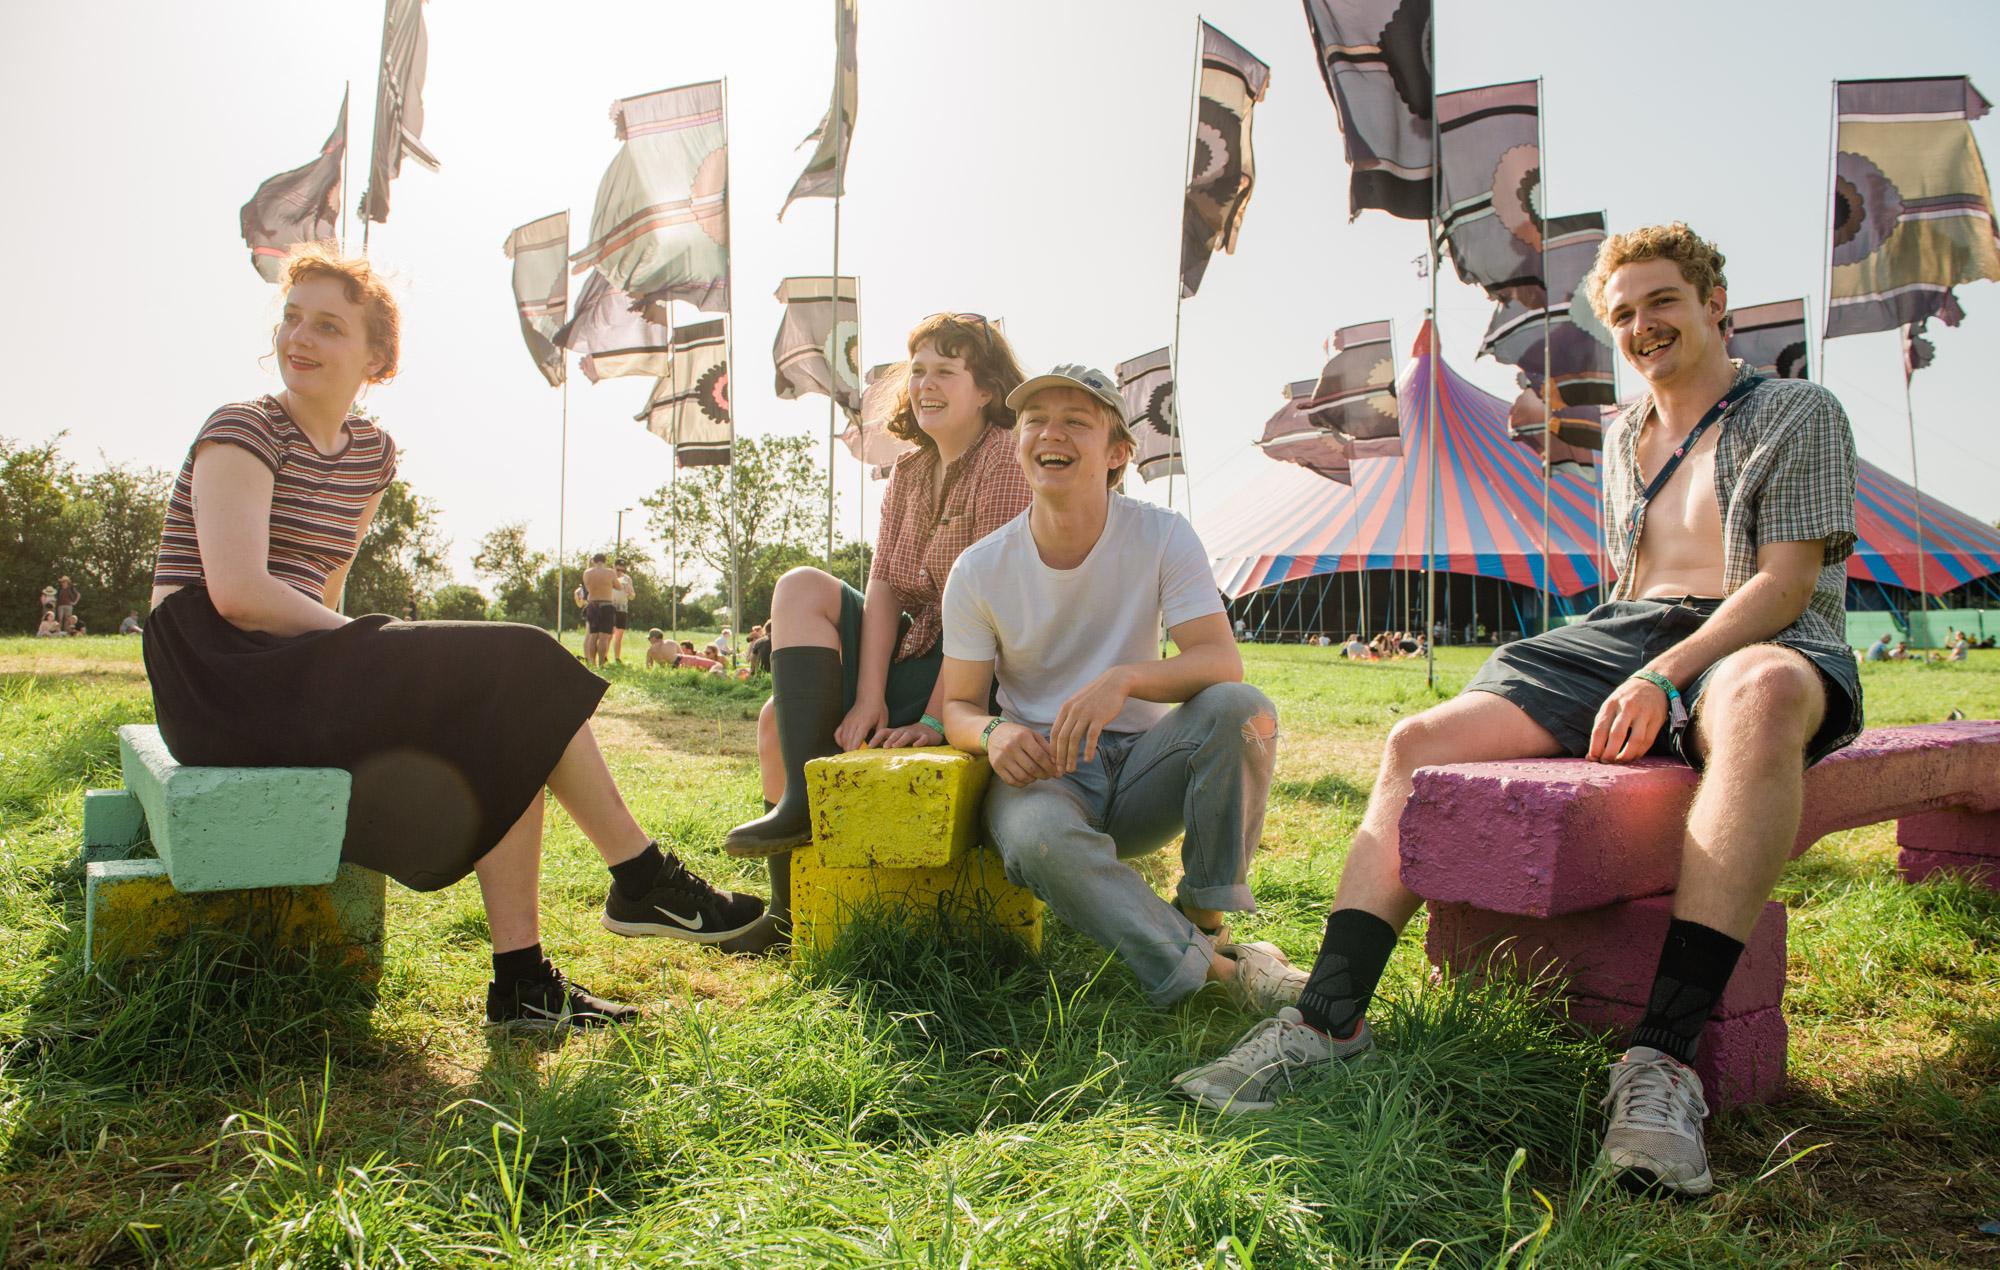 Pip Blom relax at Glastonbury festival